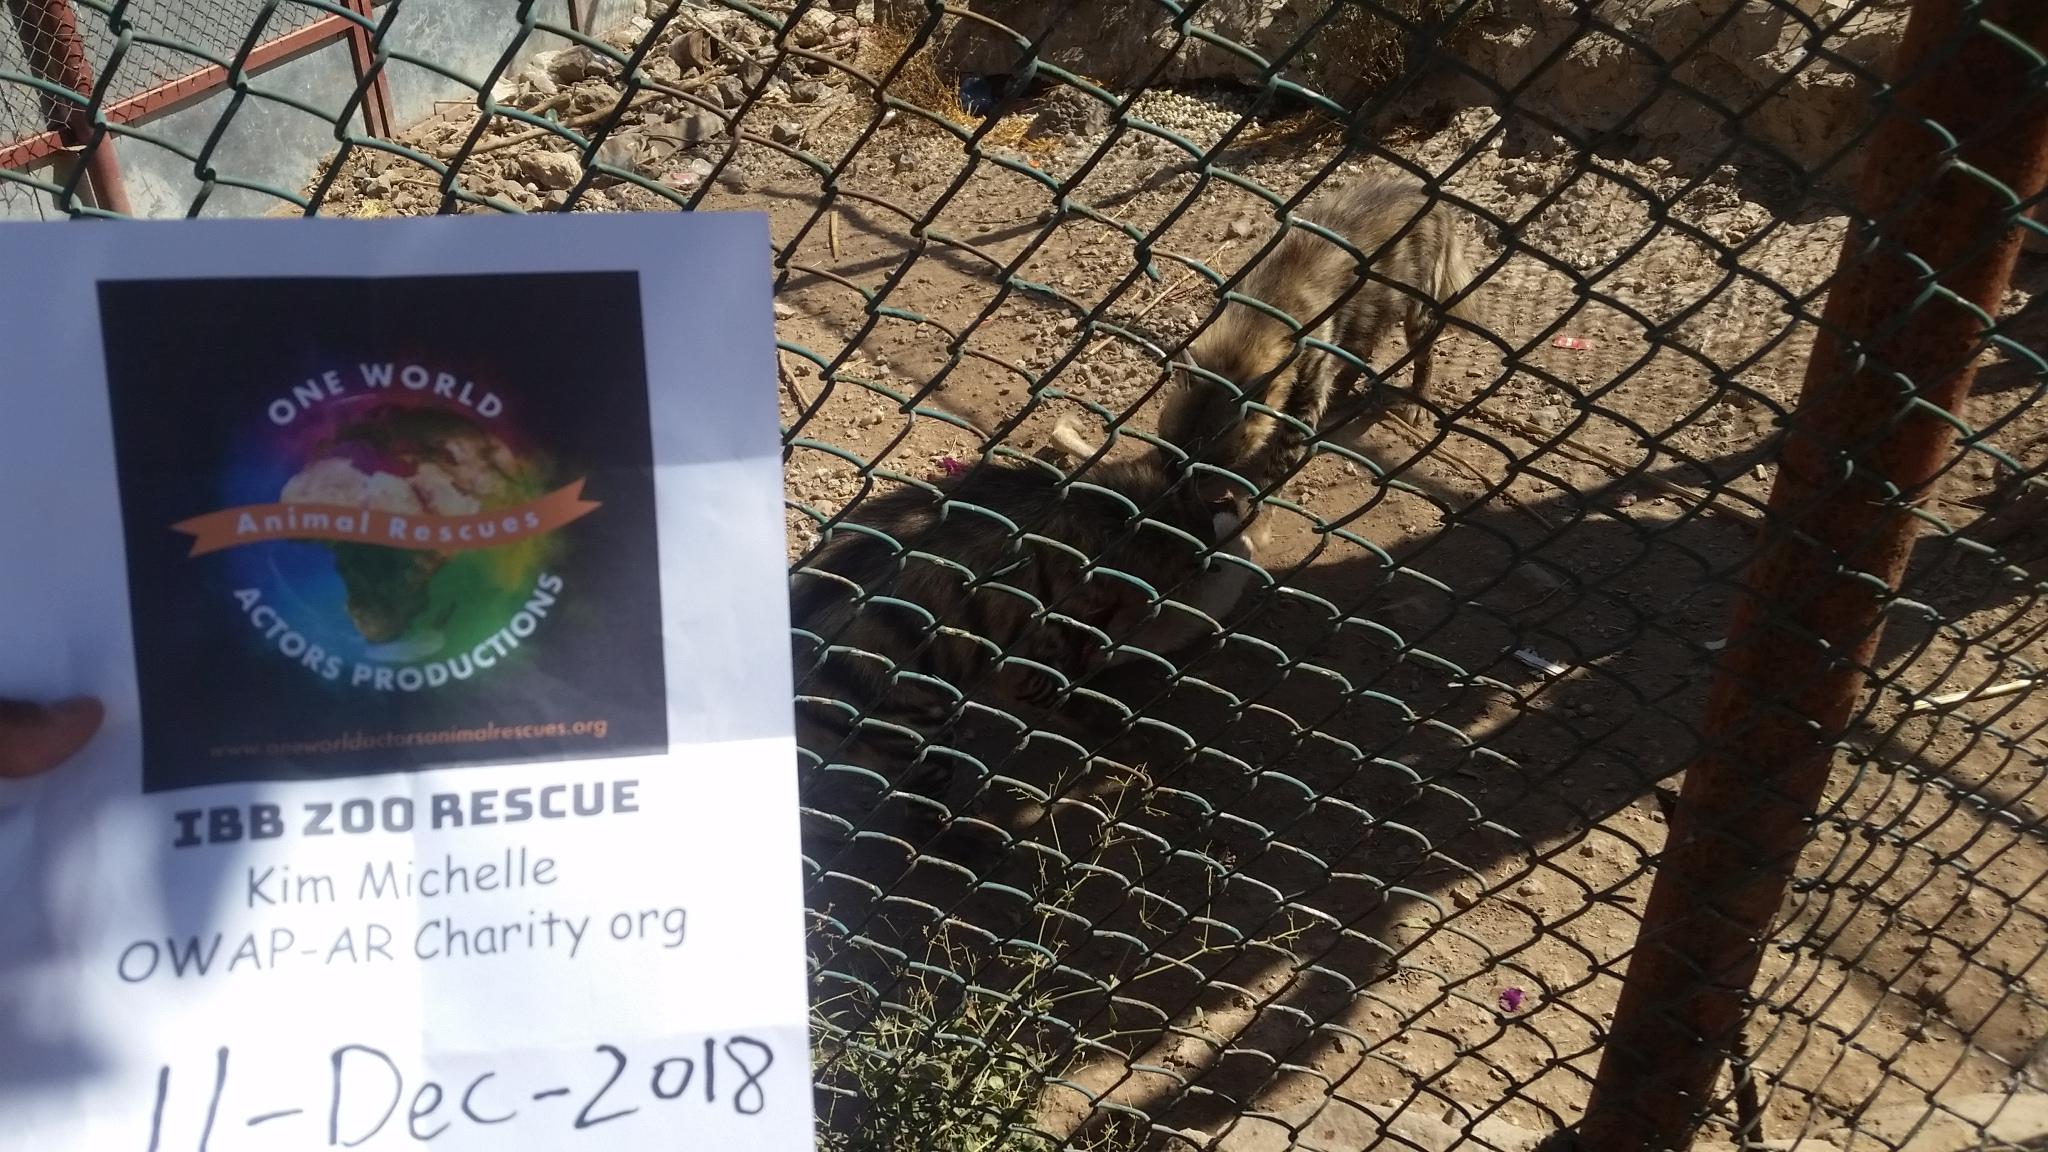 ibb zoo hyenas feasting OWAPAR sign 11 DEC 2018.jpg